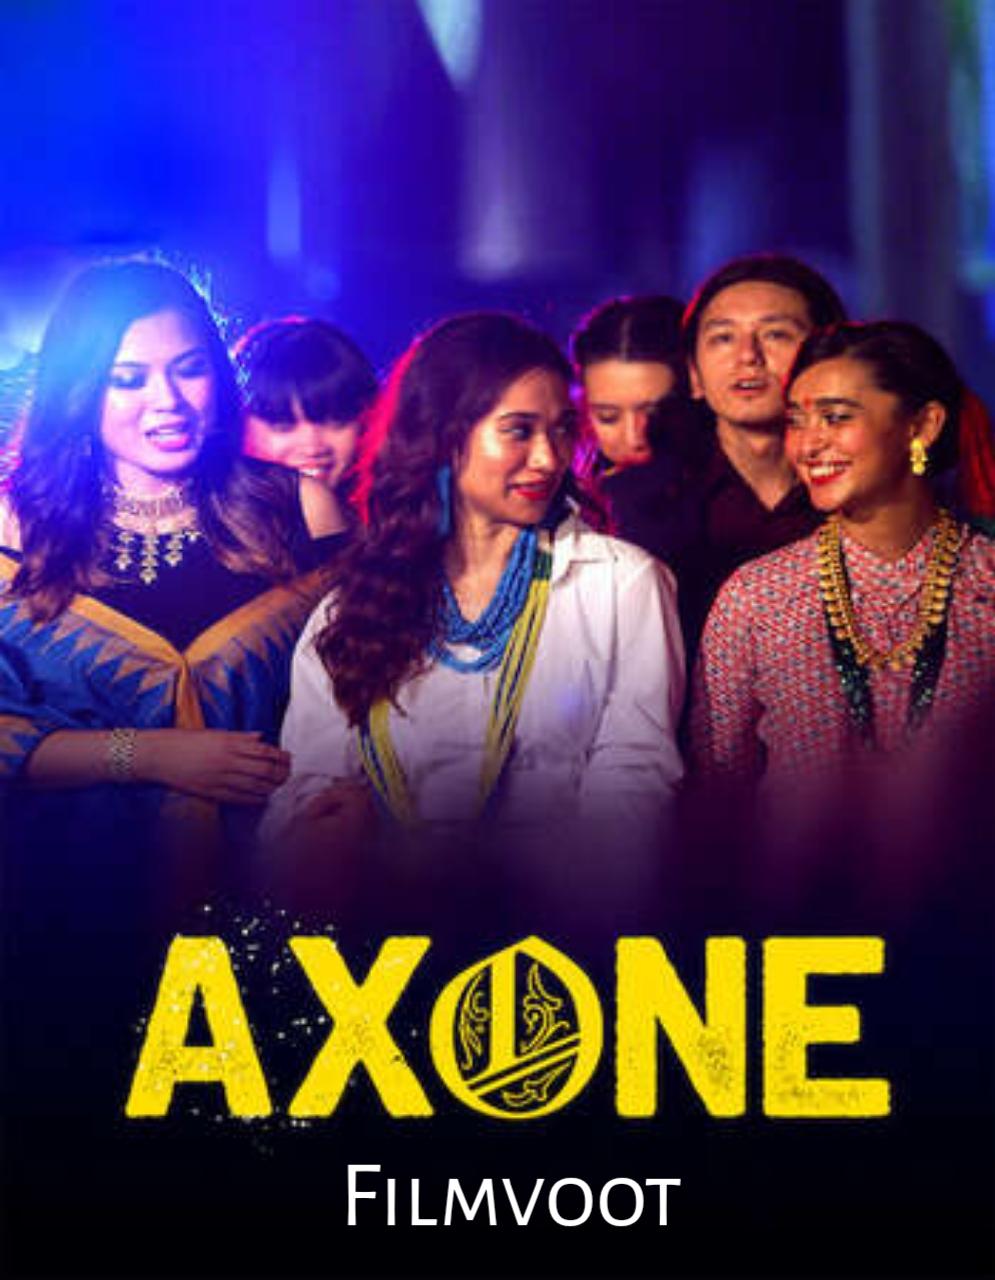 axone full movie download 480p